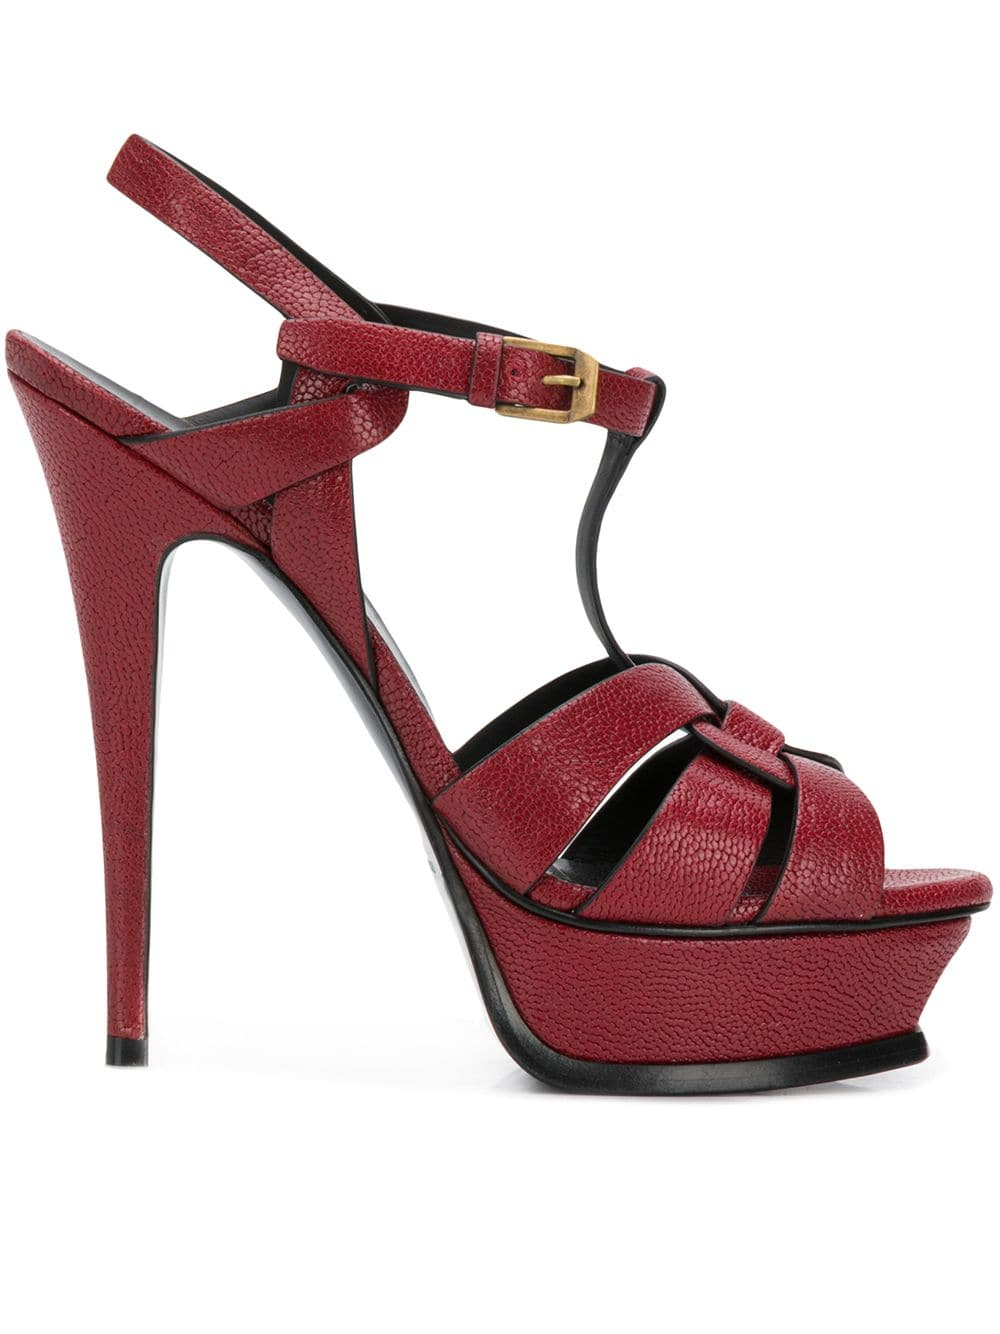 096806c09471 Red Tribute Sandal 105 - SAINT LAURENT - Russocapri